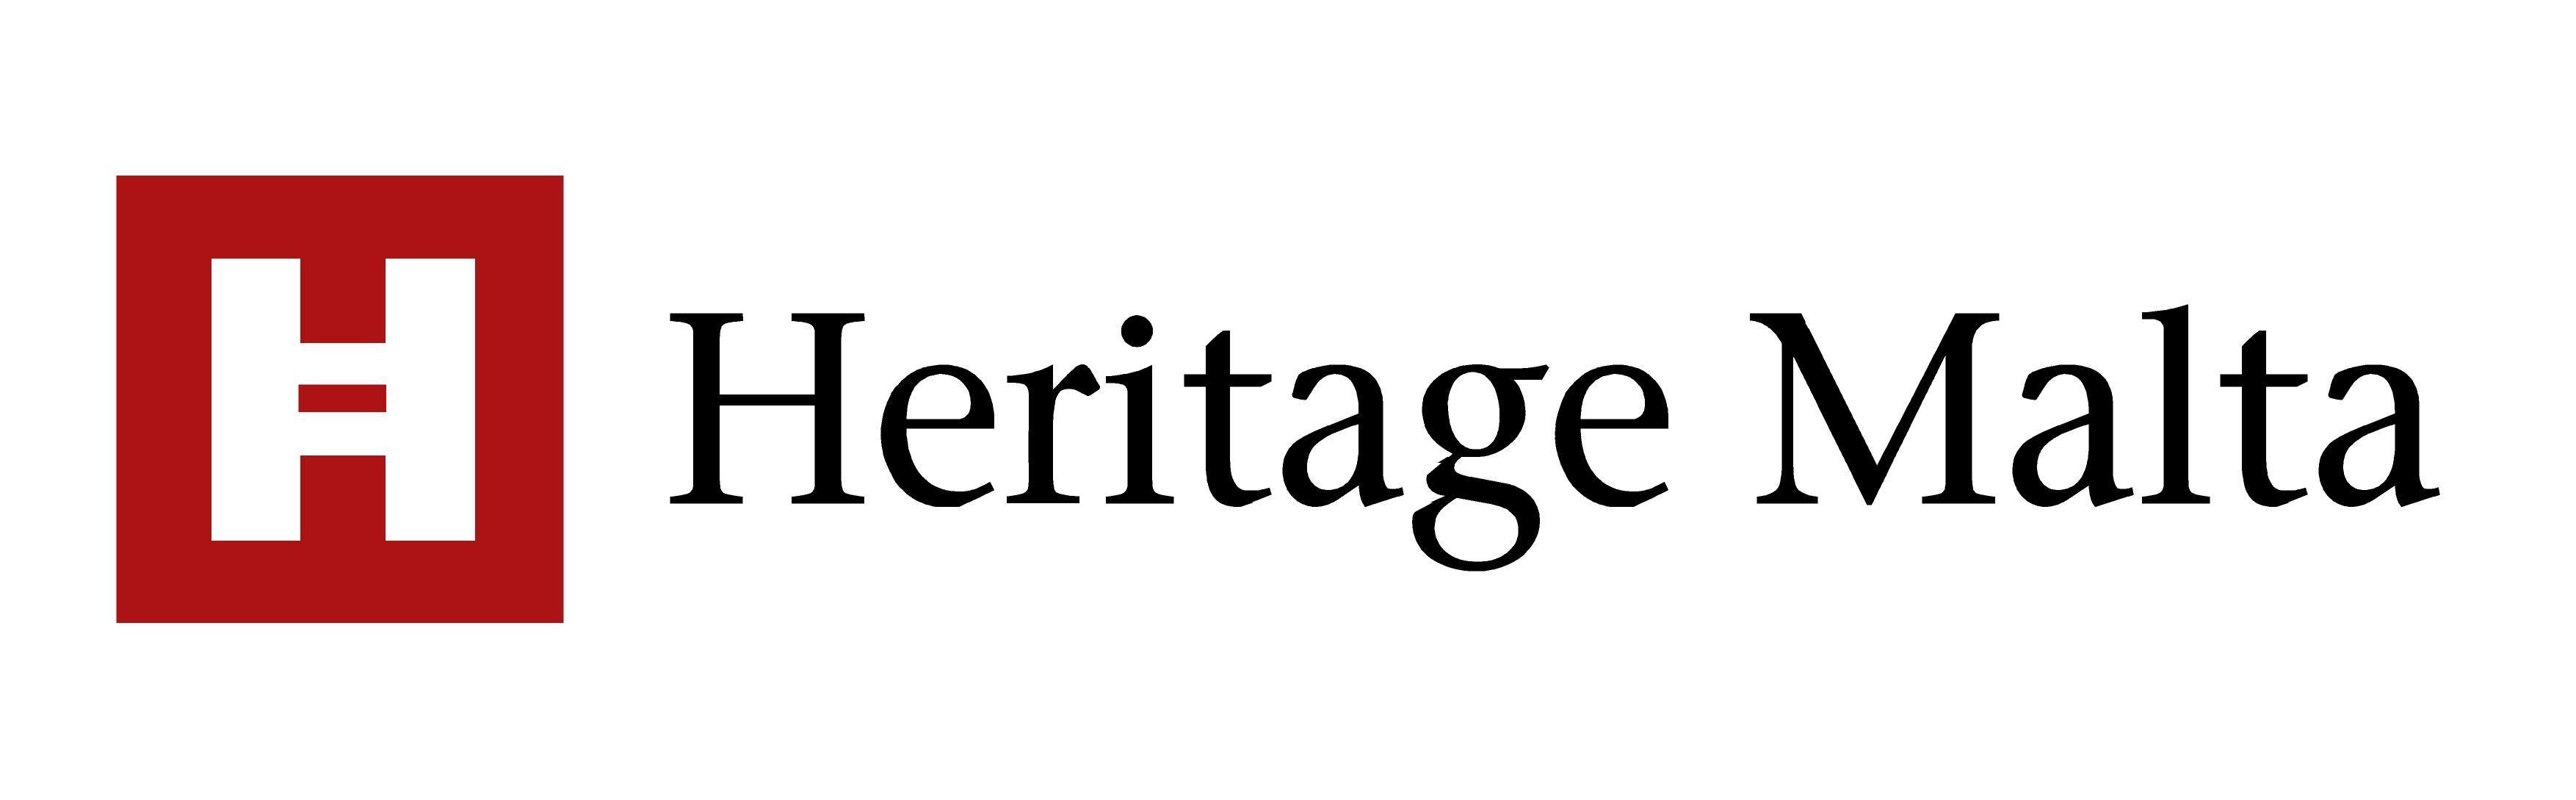 Heritage Malta Logo